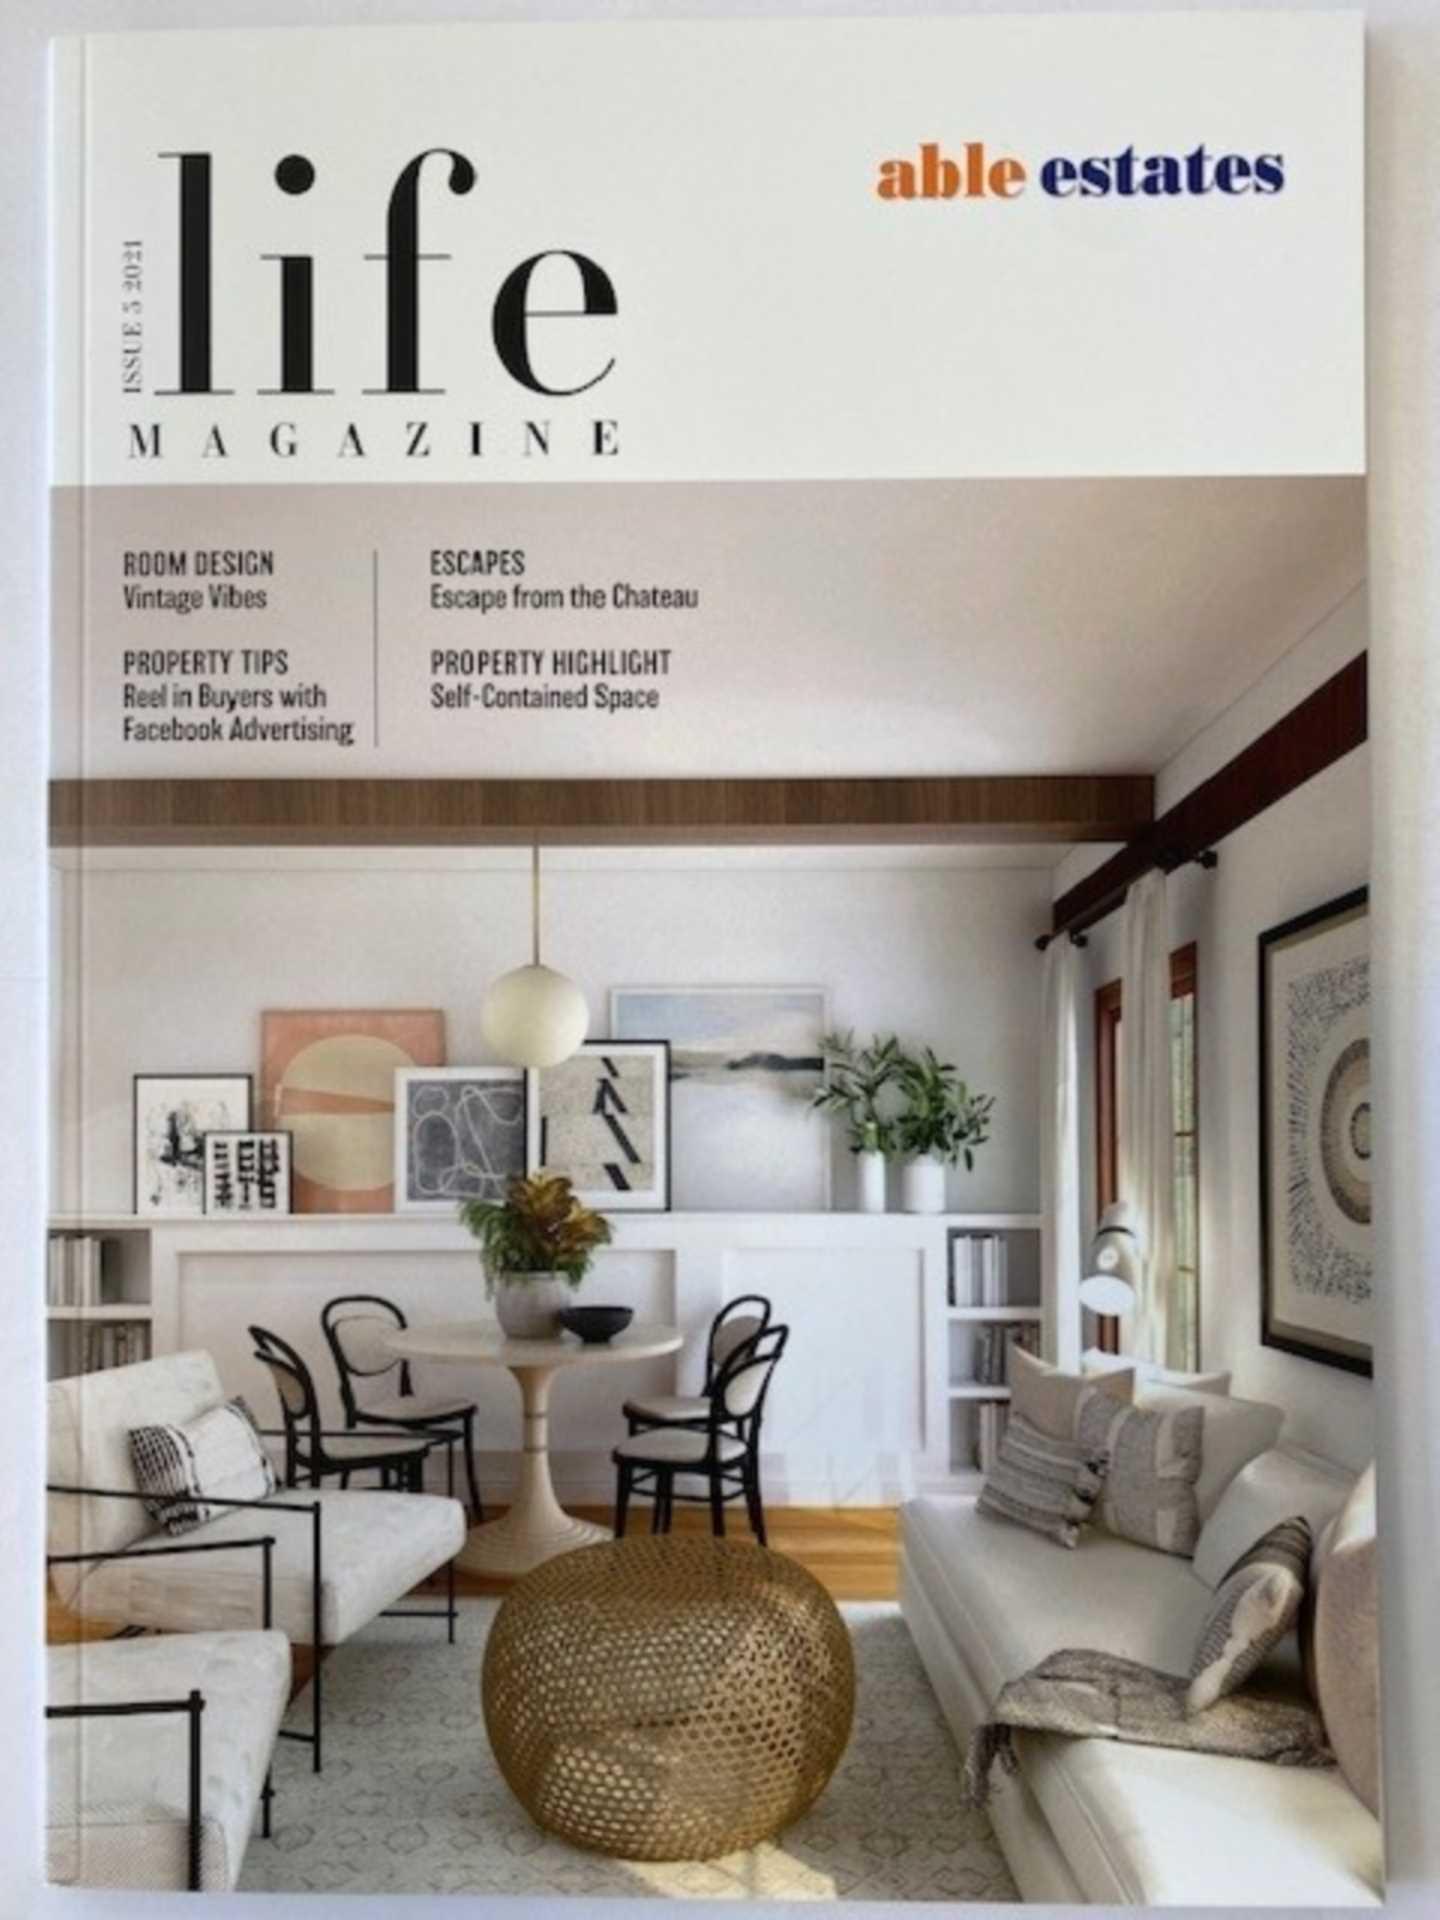 Able Estates Life Magazine.